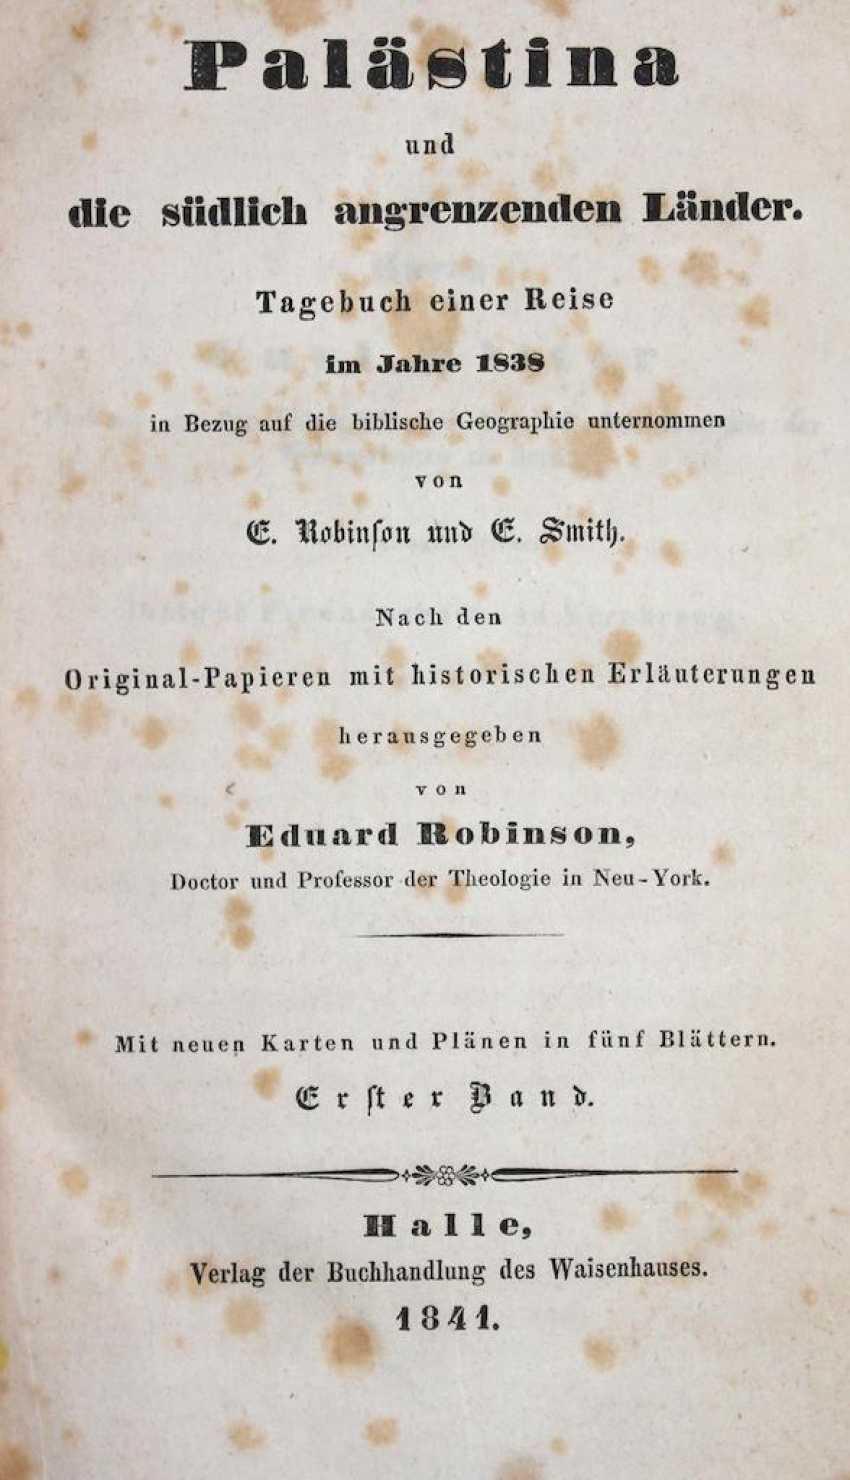 Robinson, E. u. E.Smith - photo 1